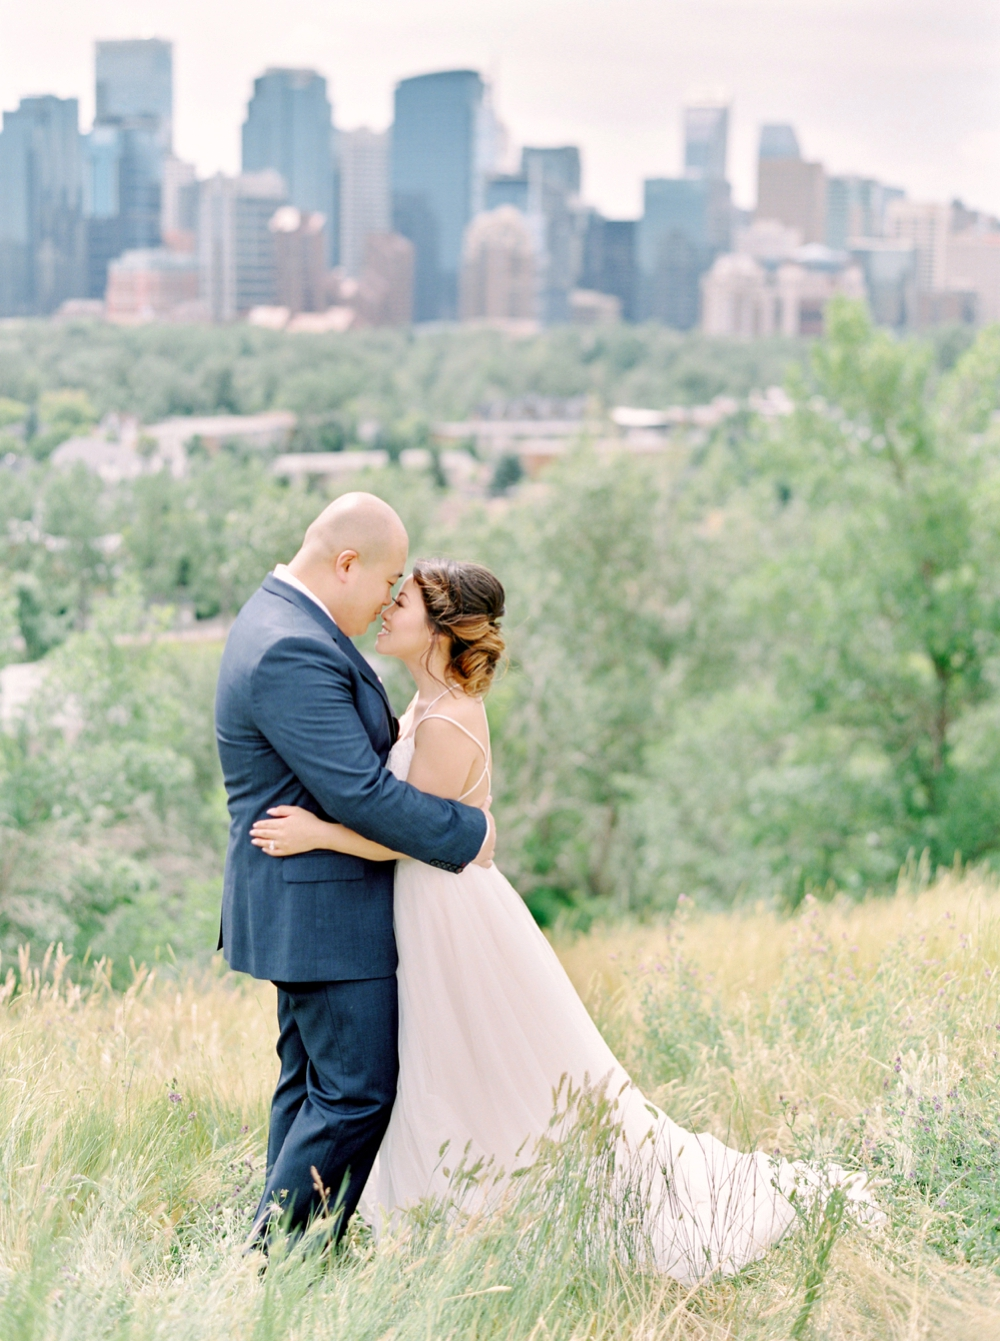 Bride and groom portraits downtown calgary | BHLDN wedding dress | Justine milton fine art wedding photographers | calgary wedding at the lake house